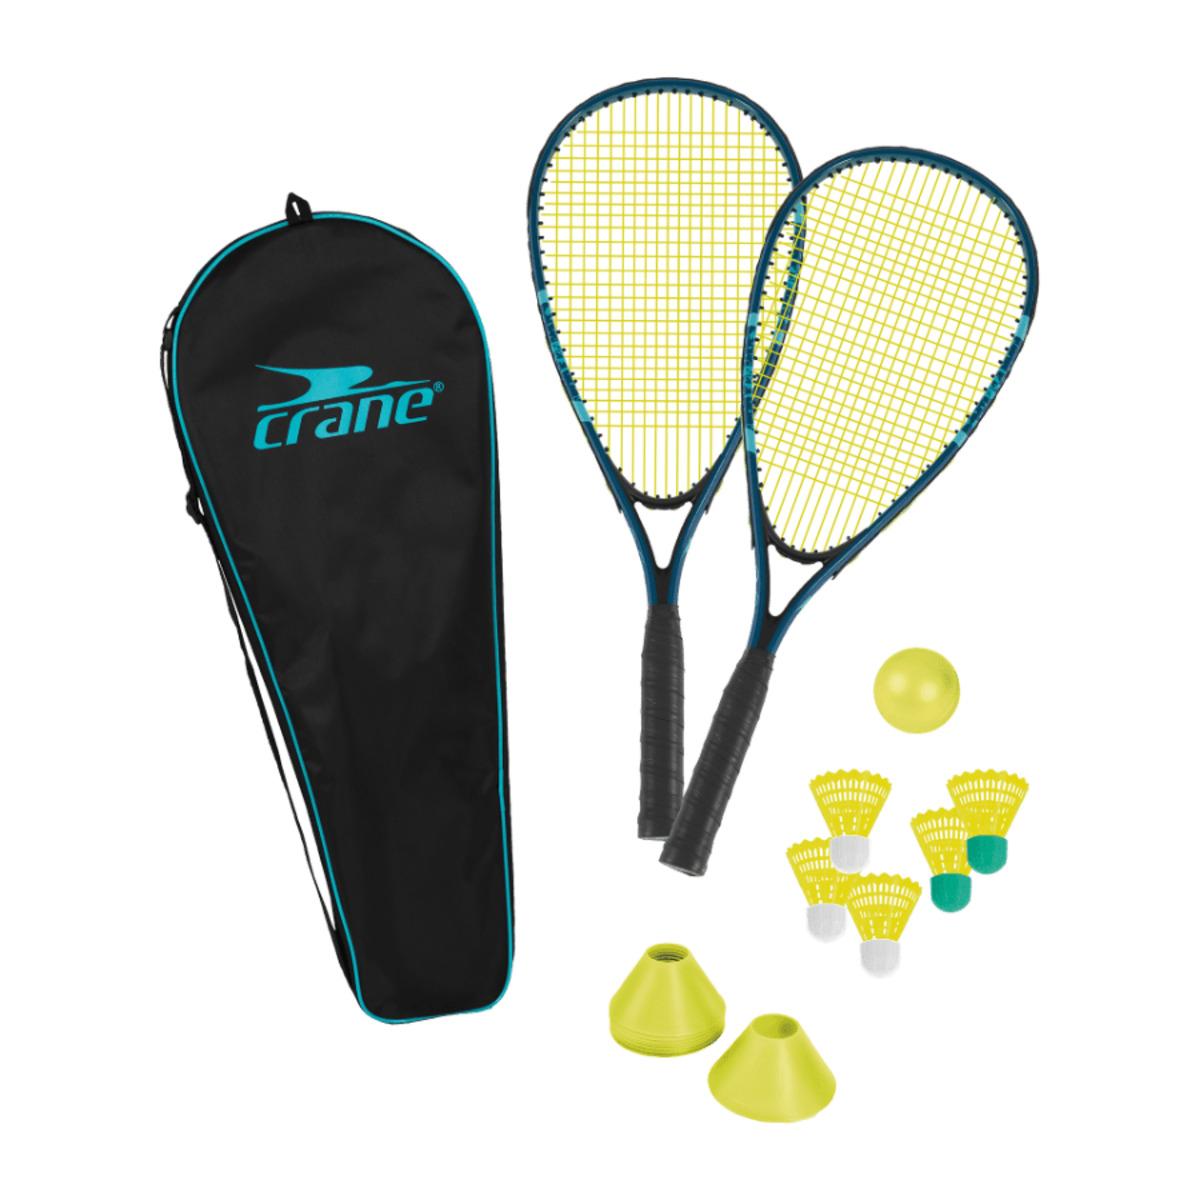 Bild 3 von CRANE     Turbo-Badminton-Set